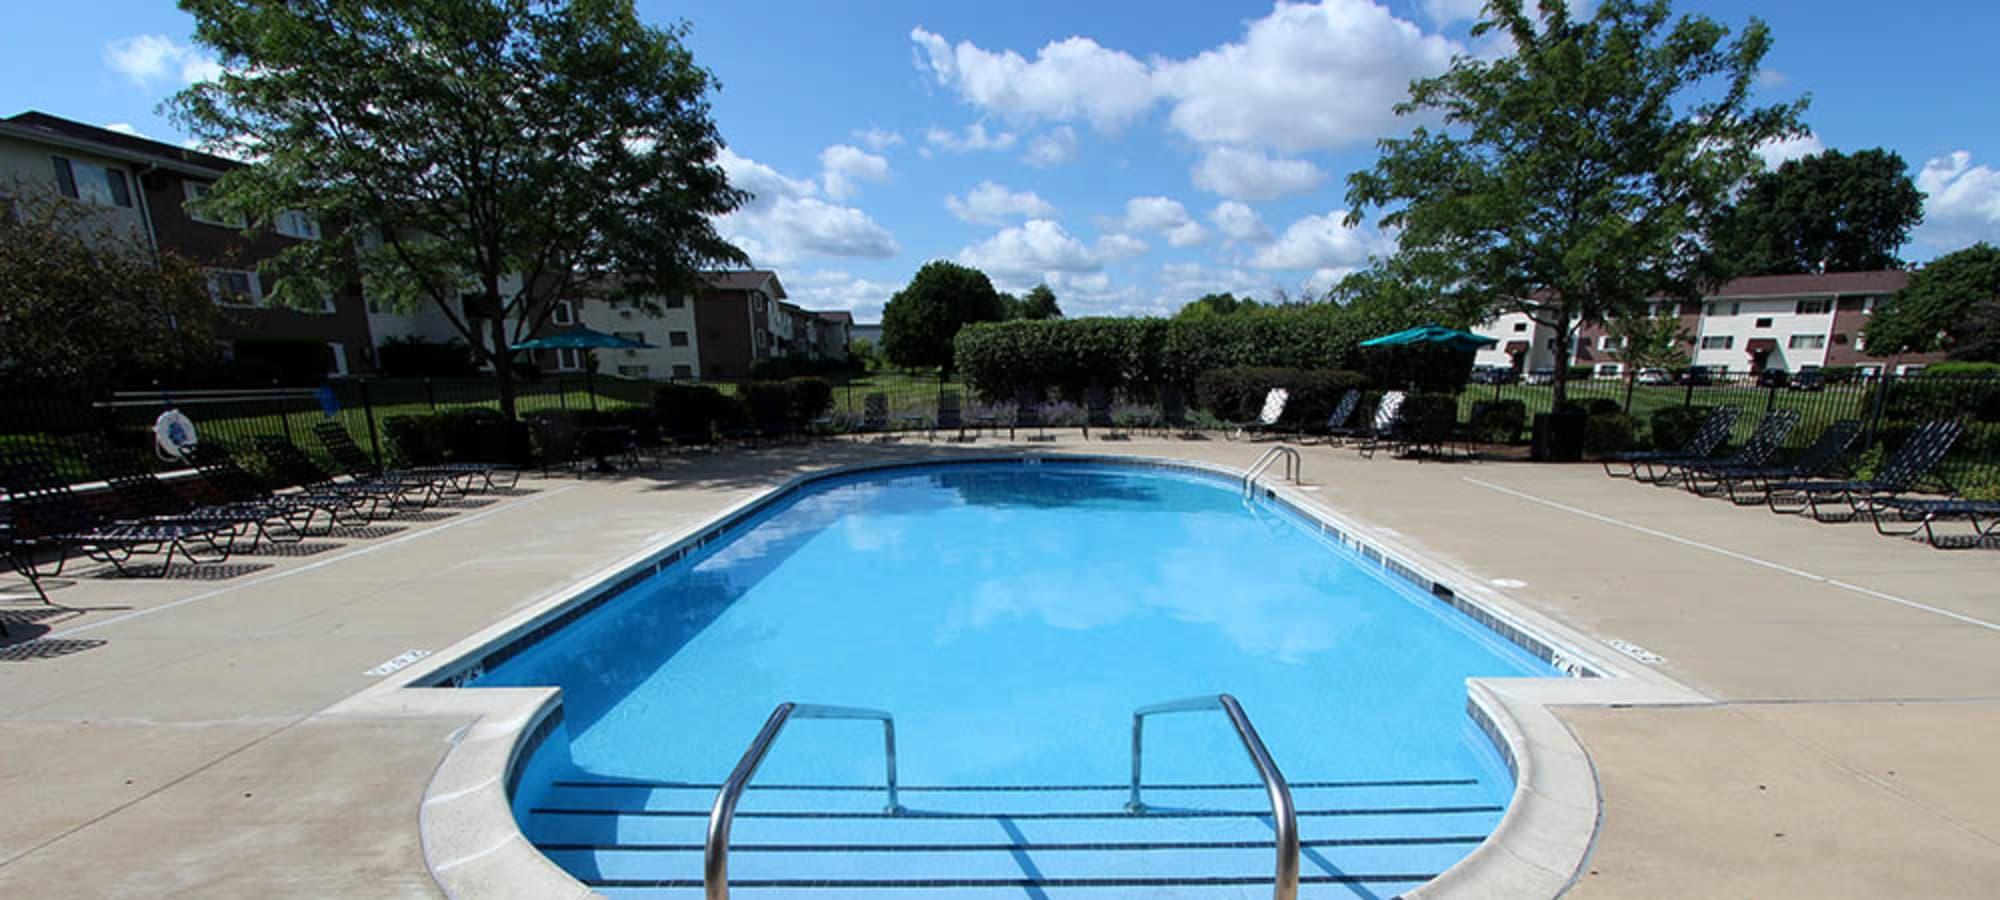 Riverstone Apartments in Bolingbrook, Illinois